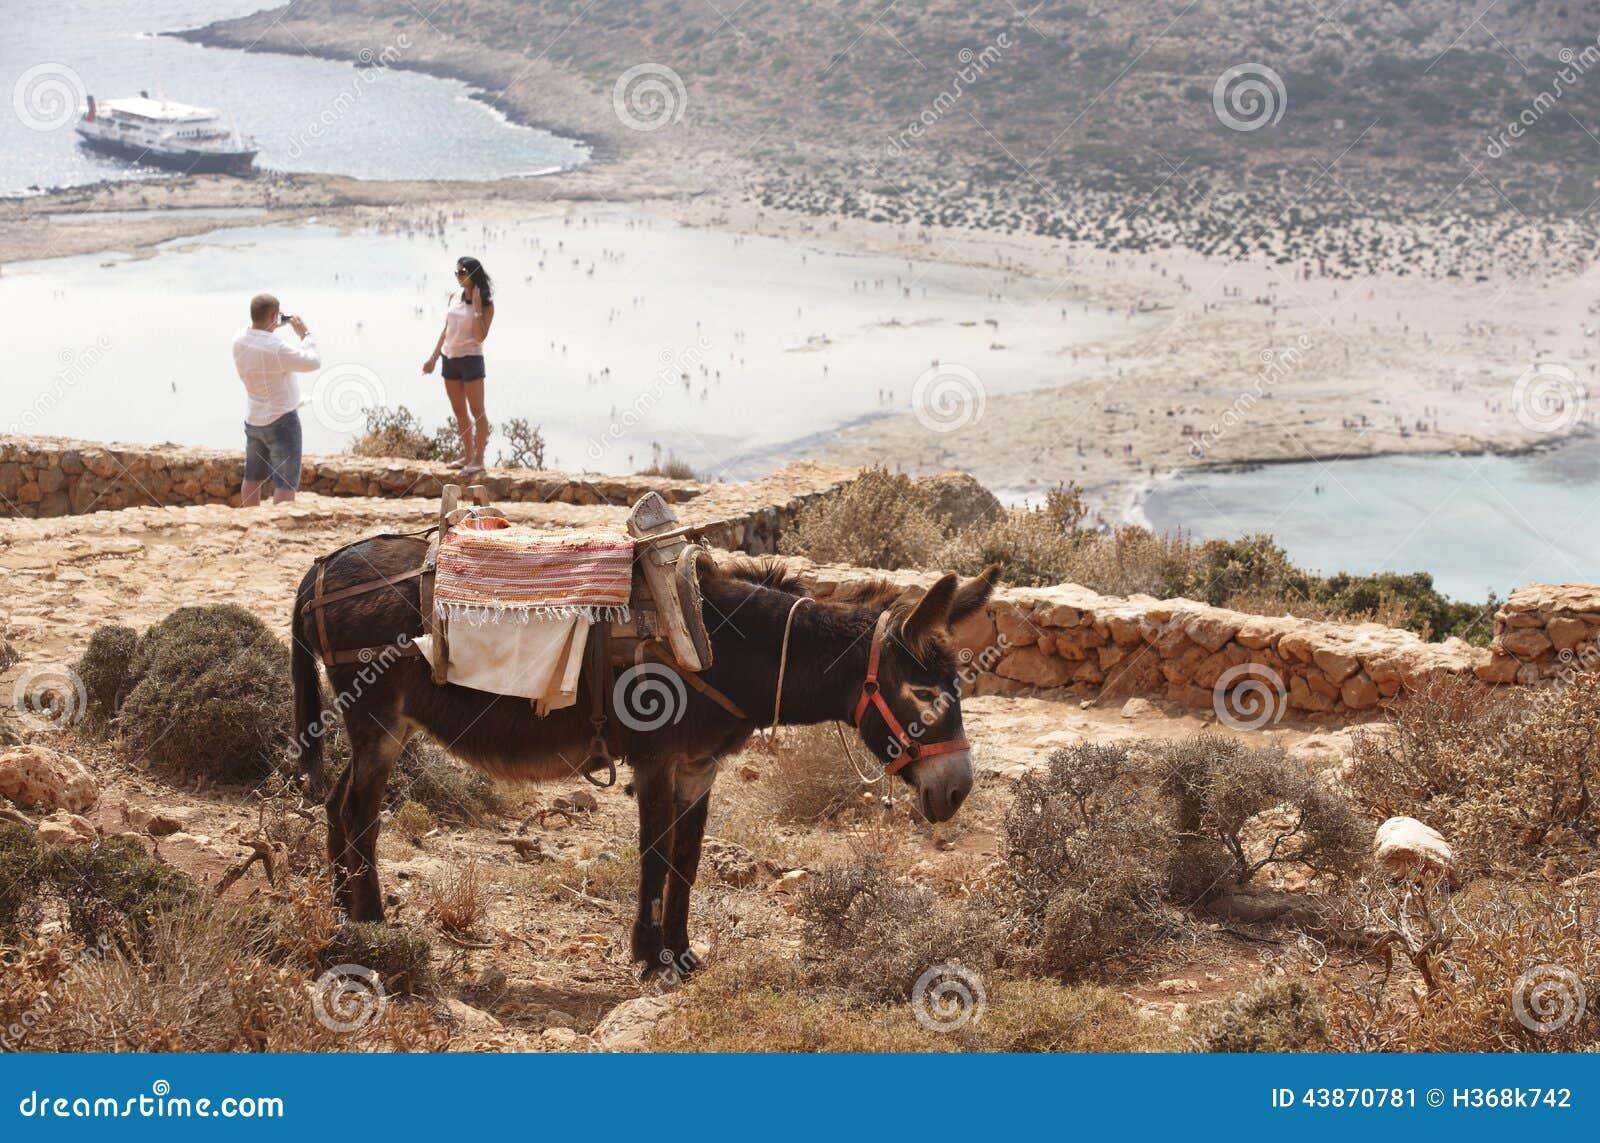 Balos beach and donkey in Crete. Mediterranean landscape. Greece